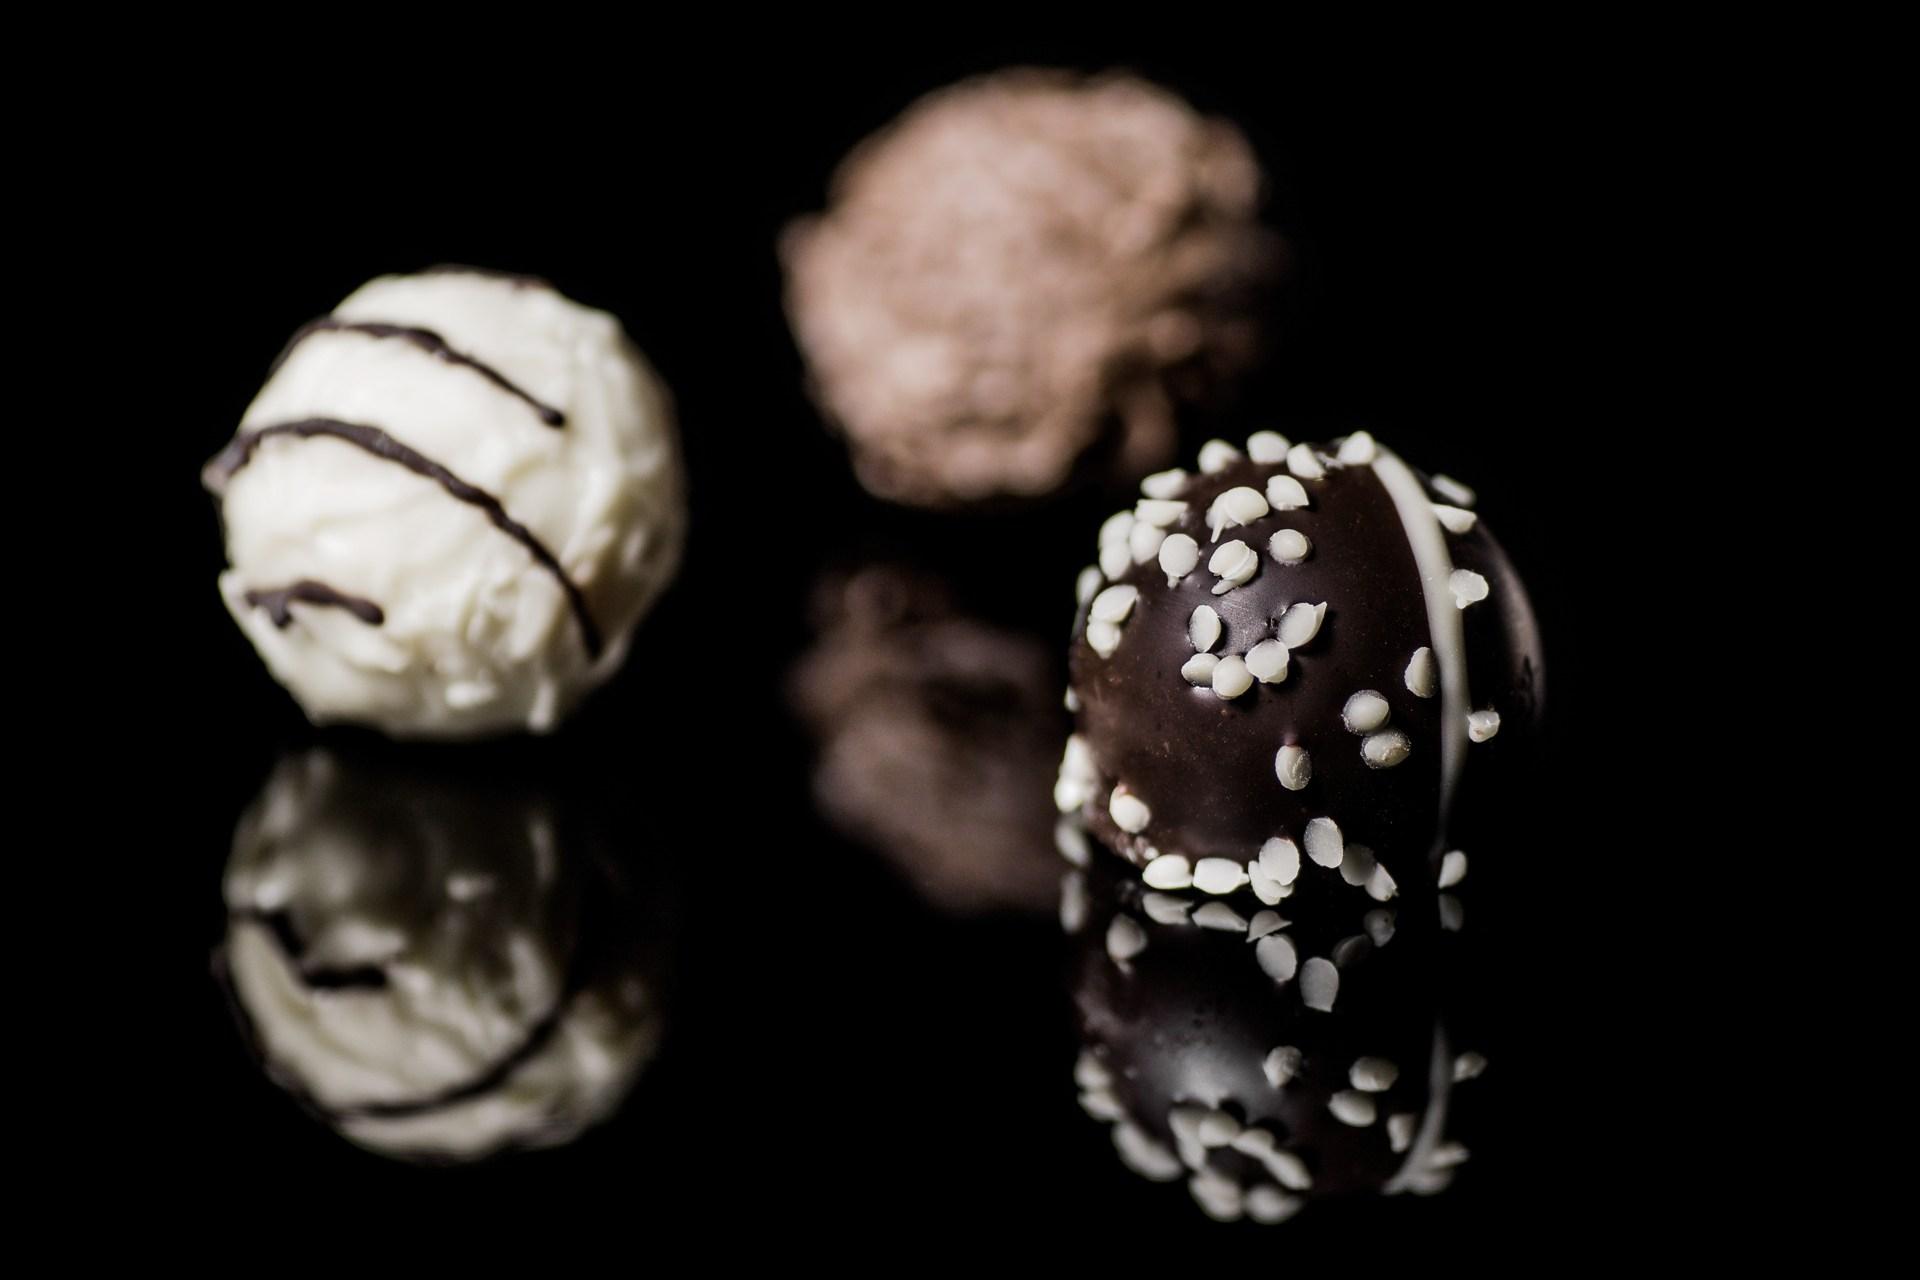 hinh nen chocolate 10